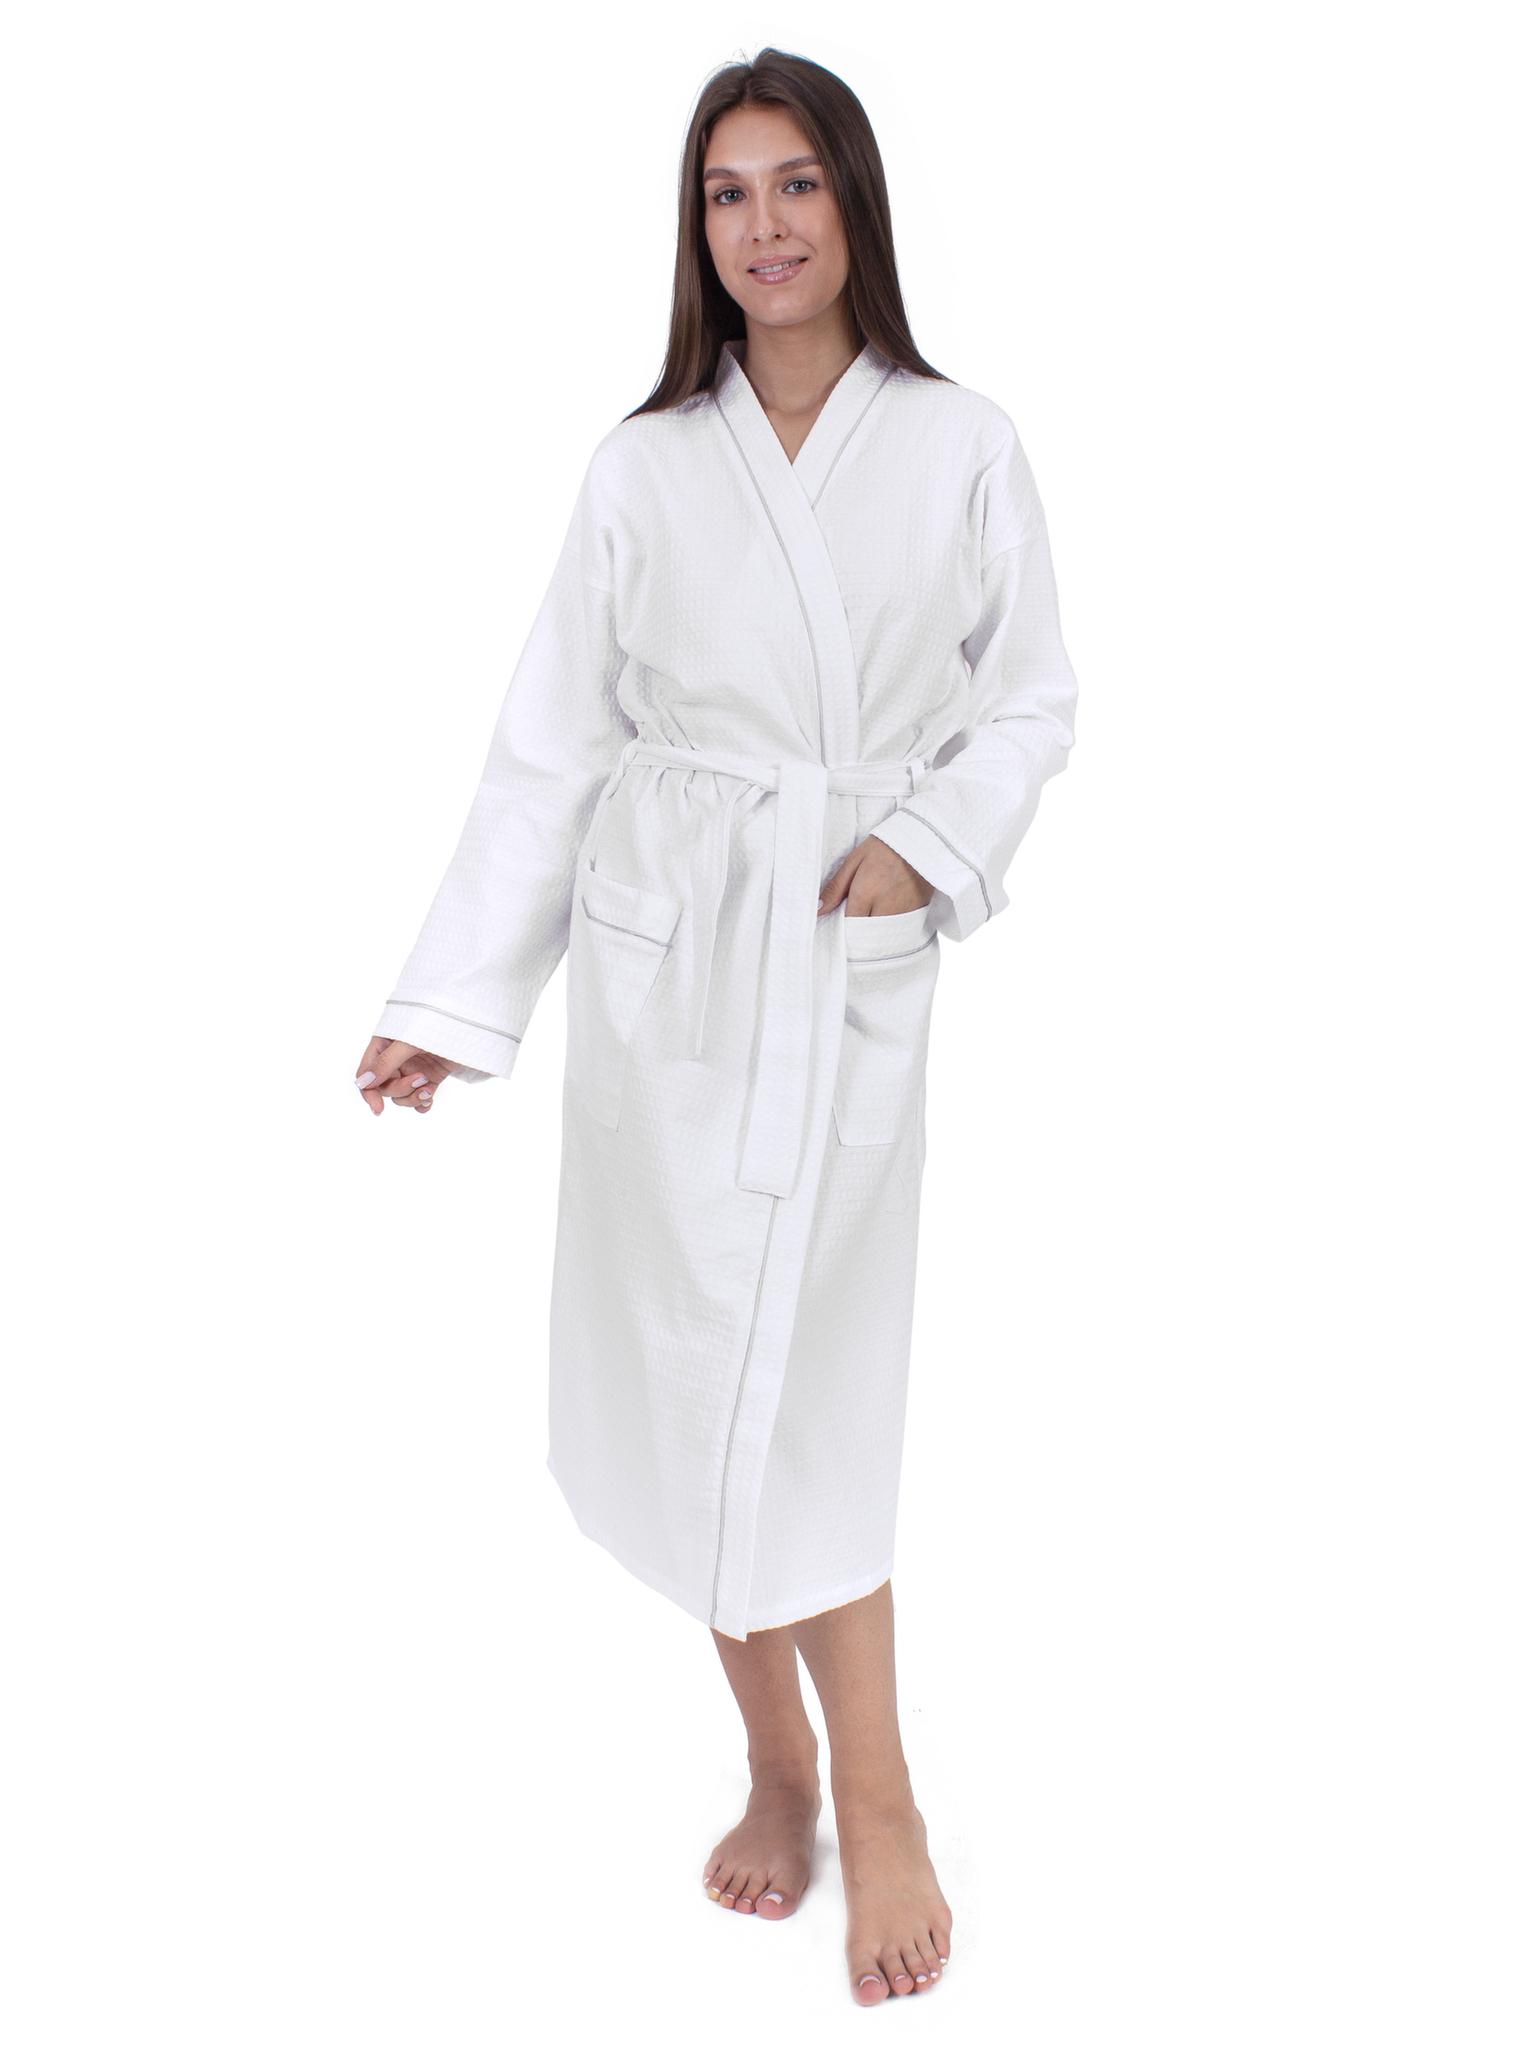 Вафельный халат белый Elintale